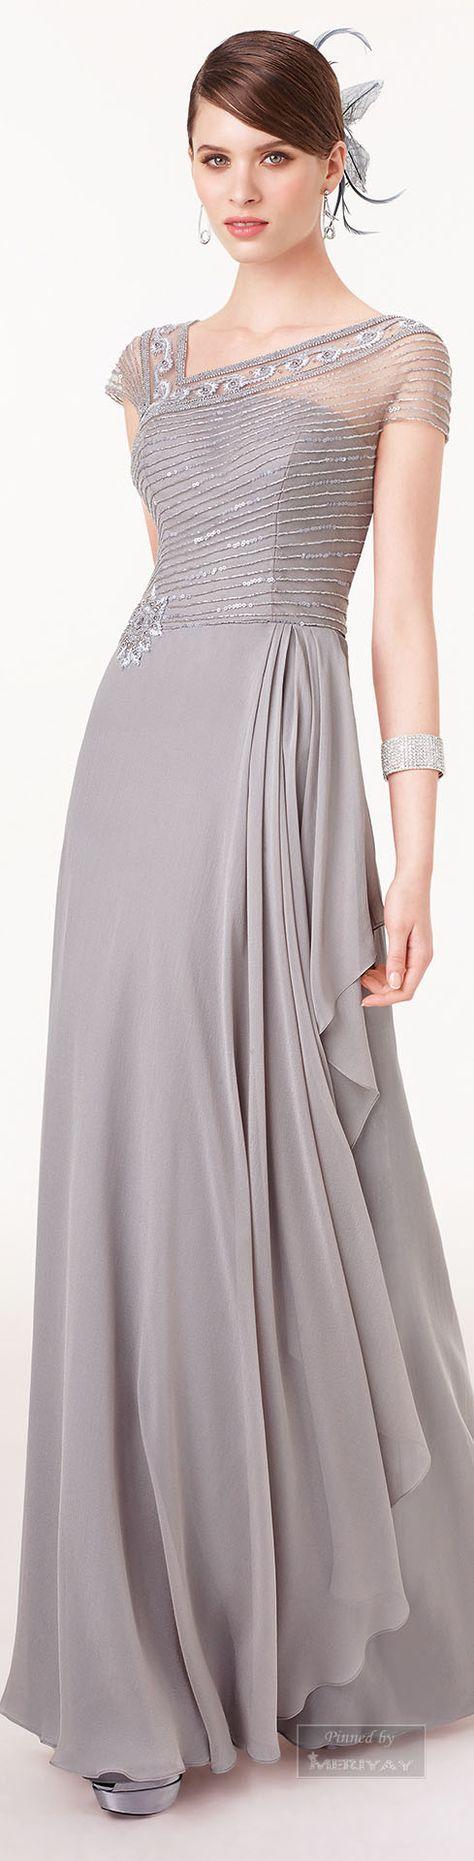 Mama de novia, velo Aire Barcelona ~ Evening Gown, Silver Grey, 2015.